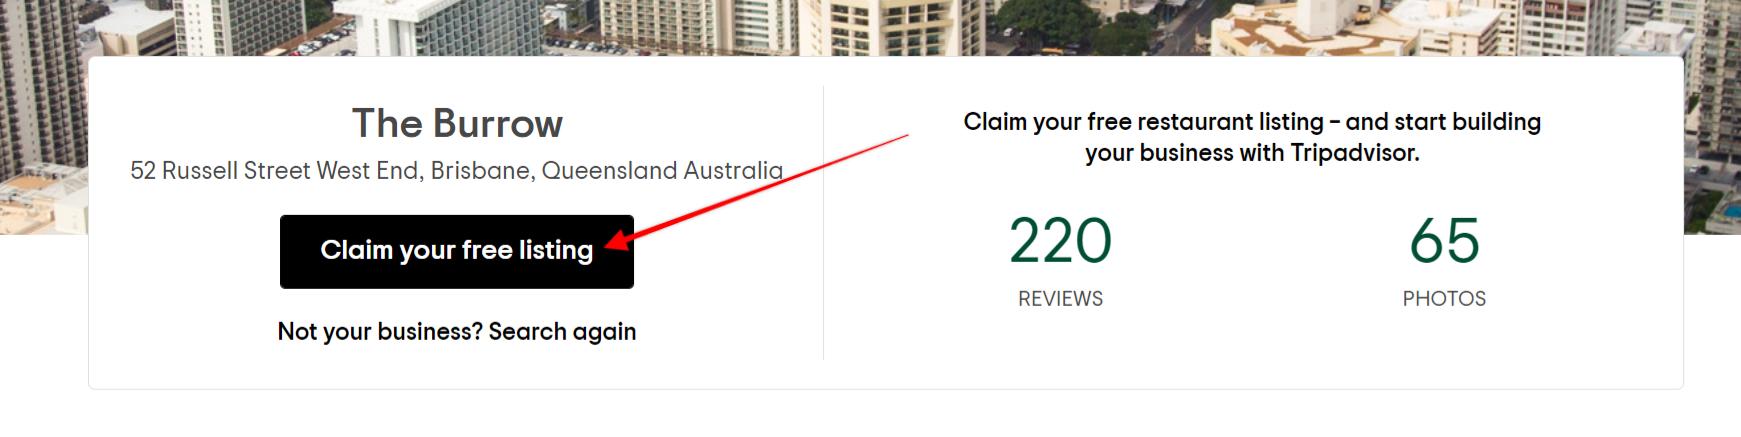 How to claim your TripAdvisor listing